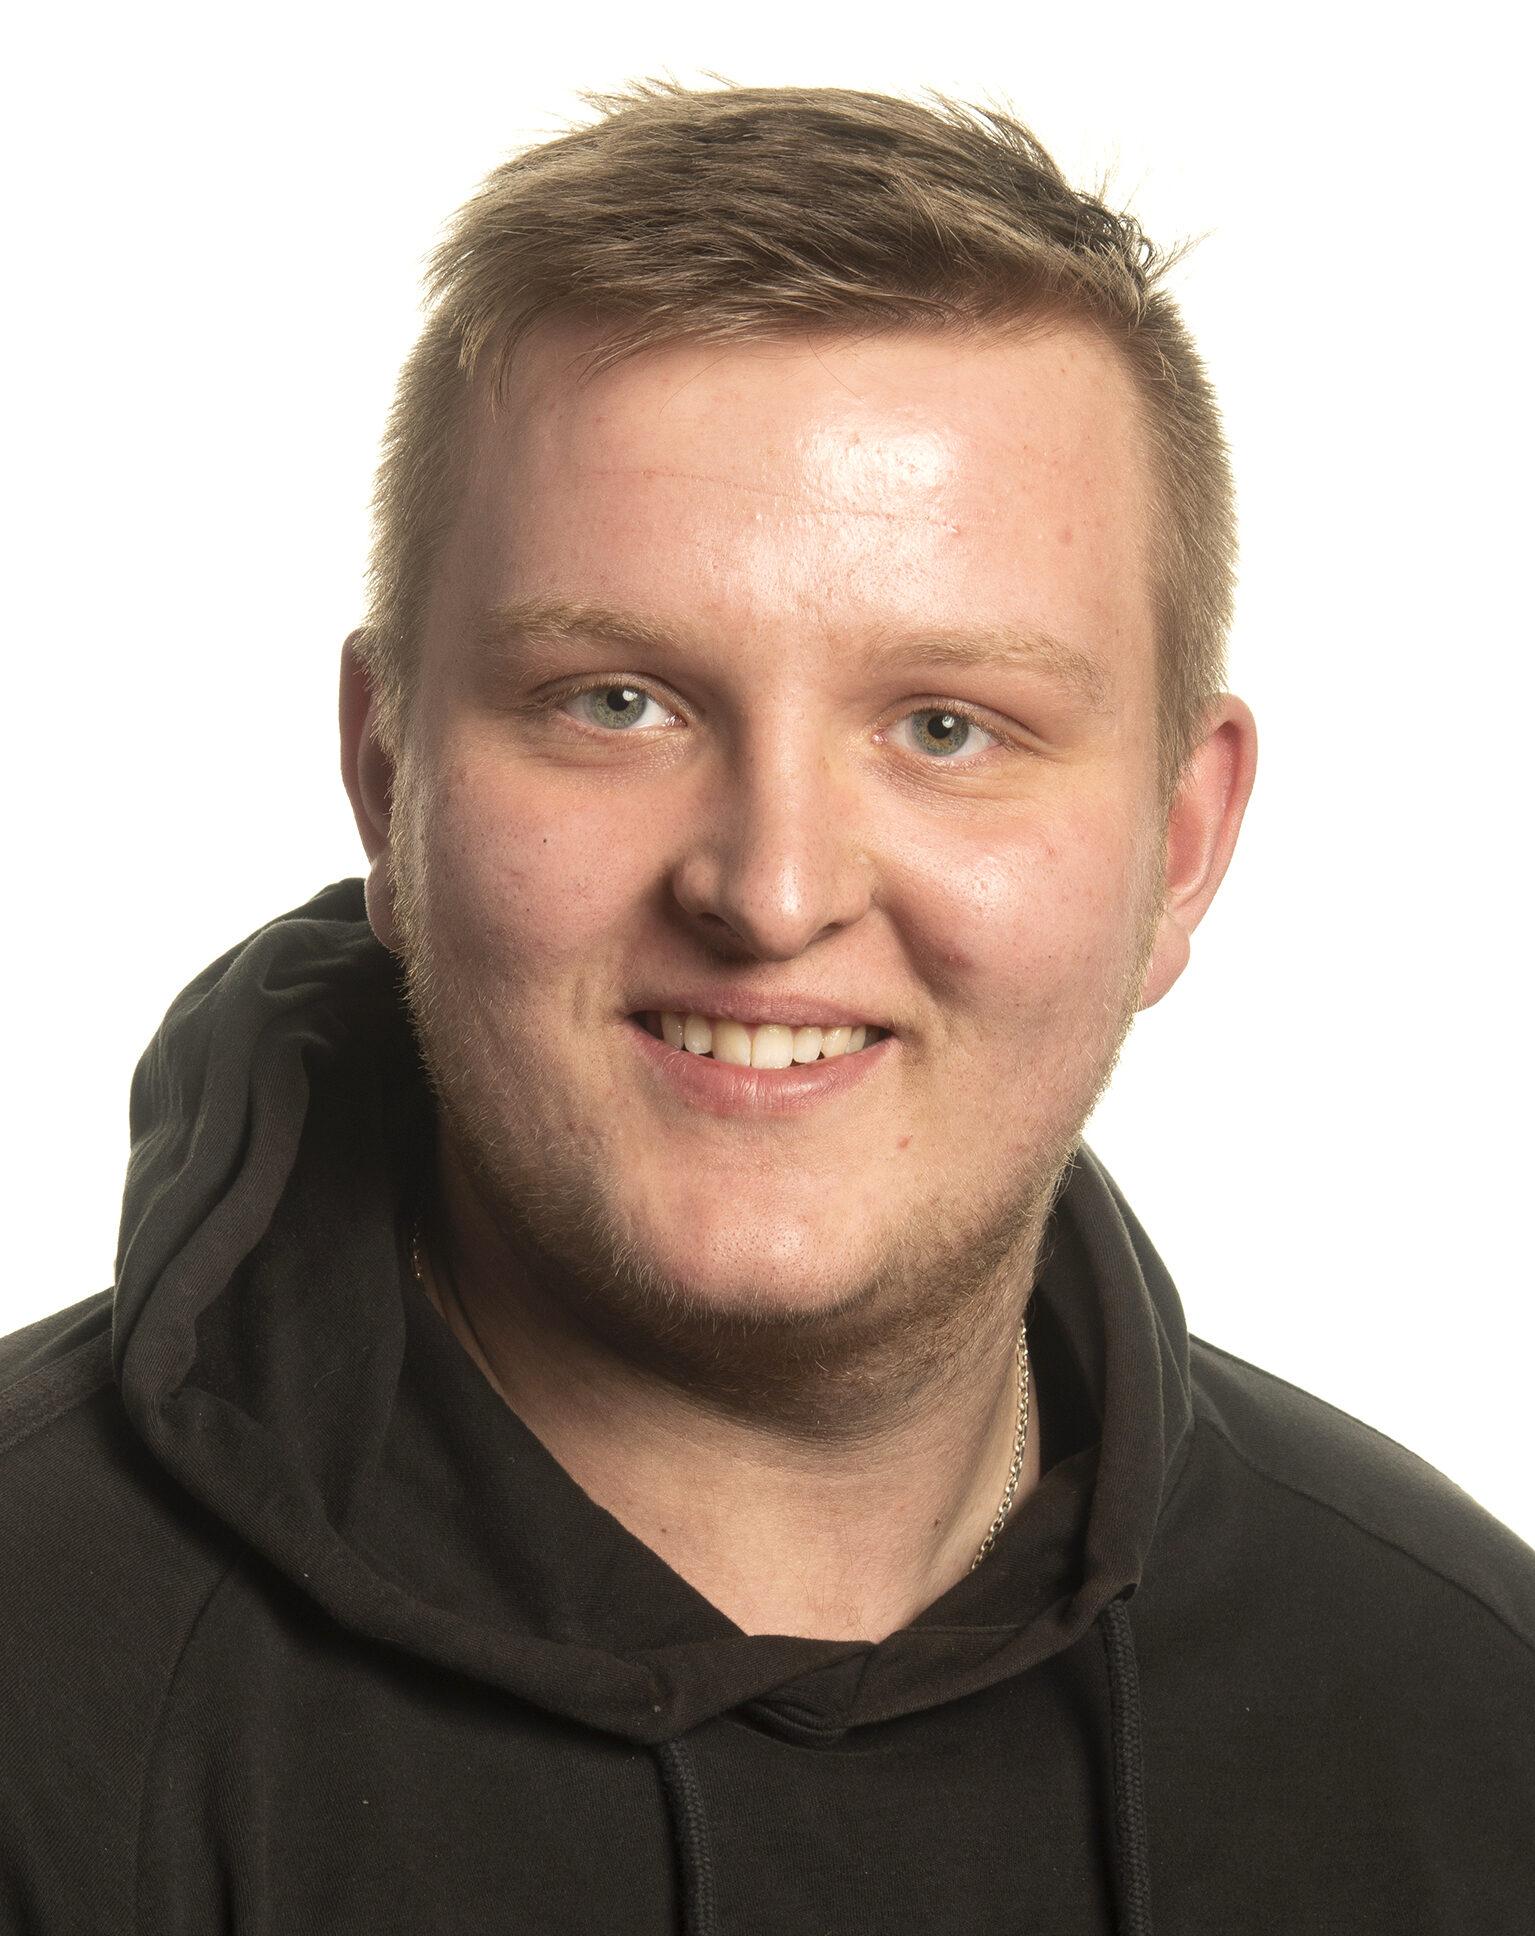 Anders Elbæk Sørensen